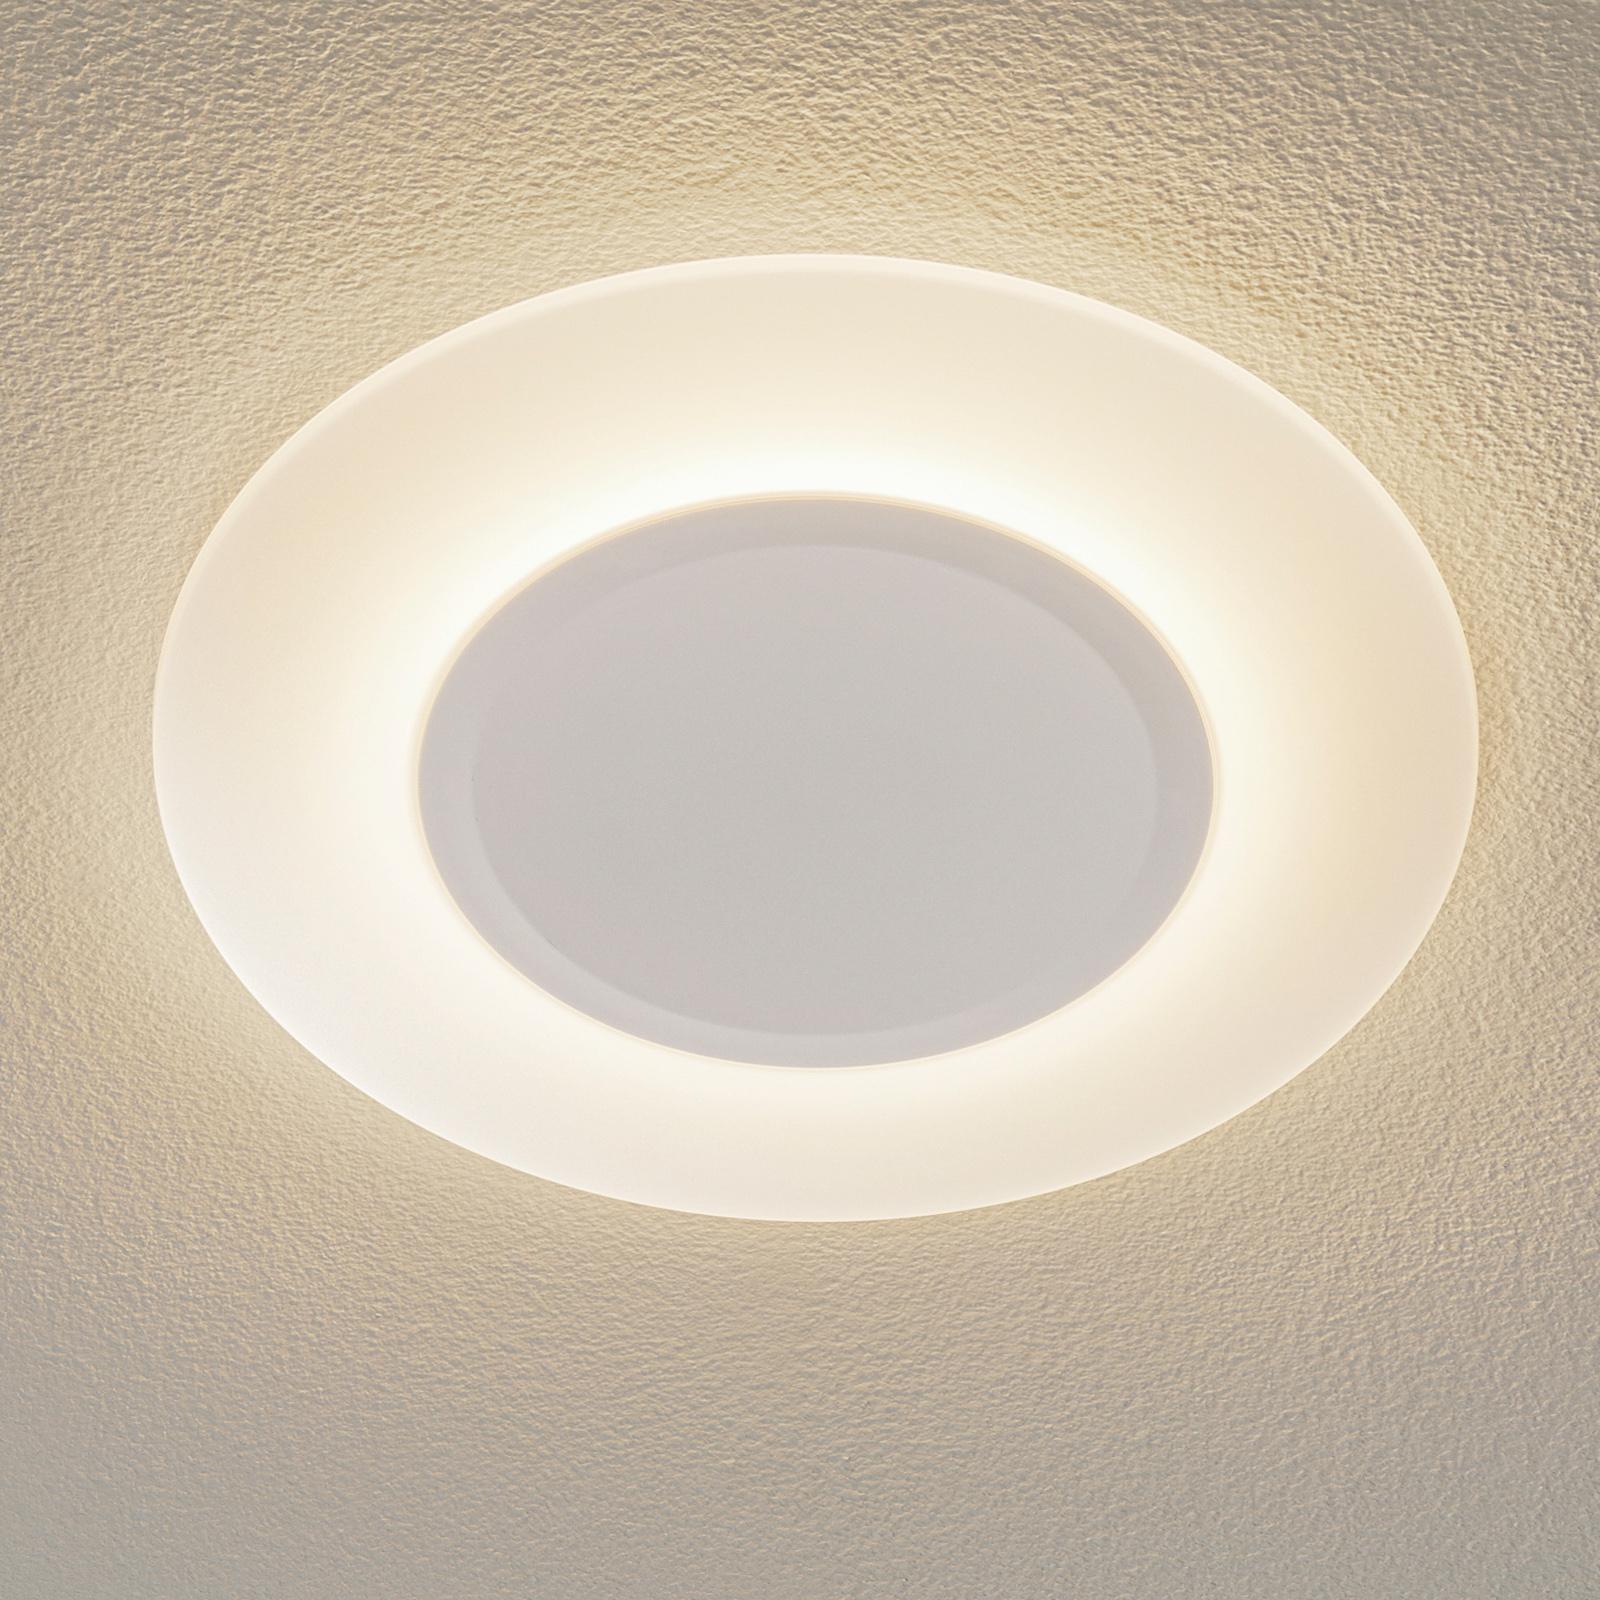 LEDVANCE LED Flat - flache LED-Deckenleuchte